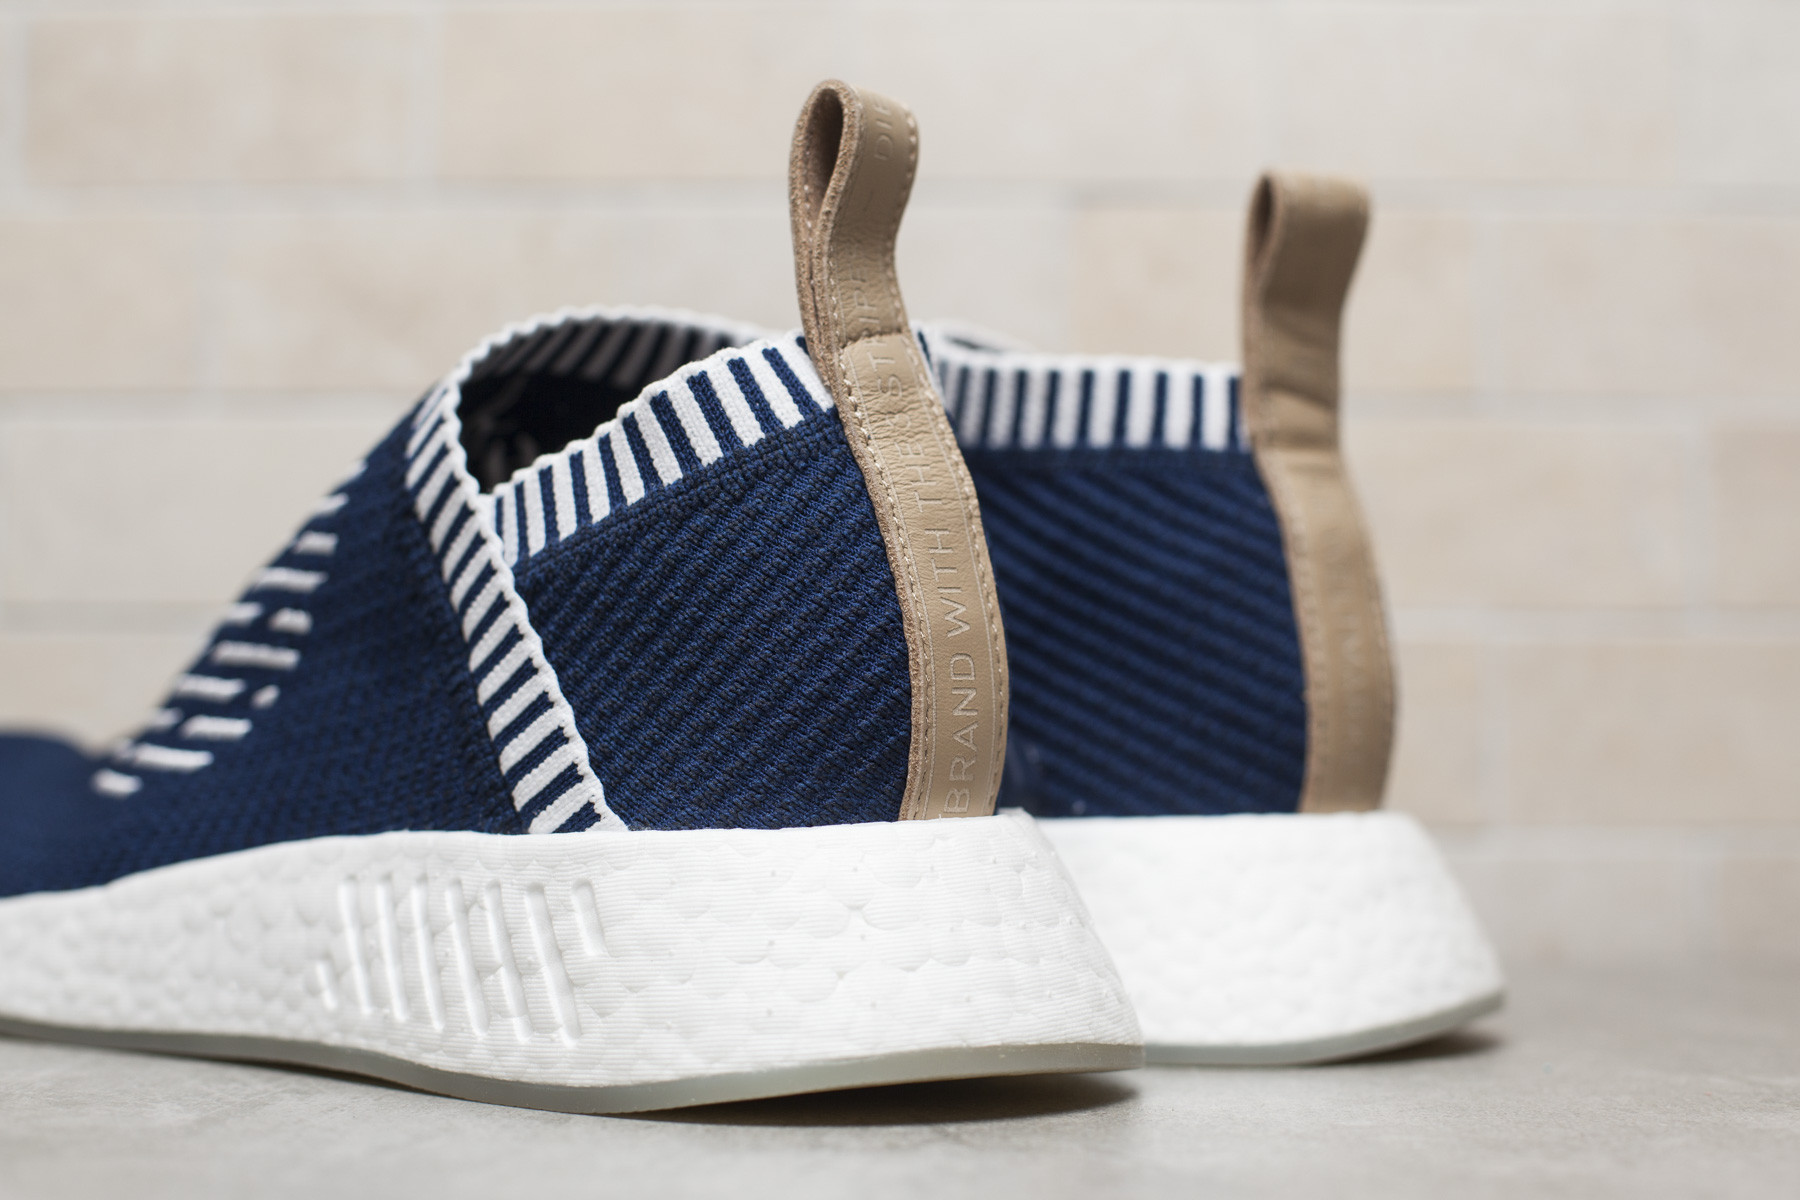 Adidas NMD_CS2 PK Sneaker.no